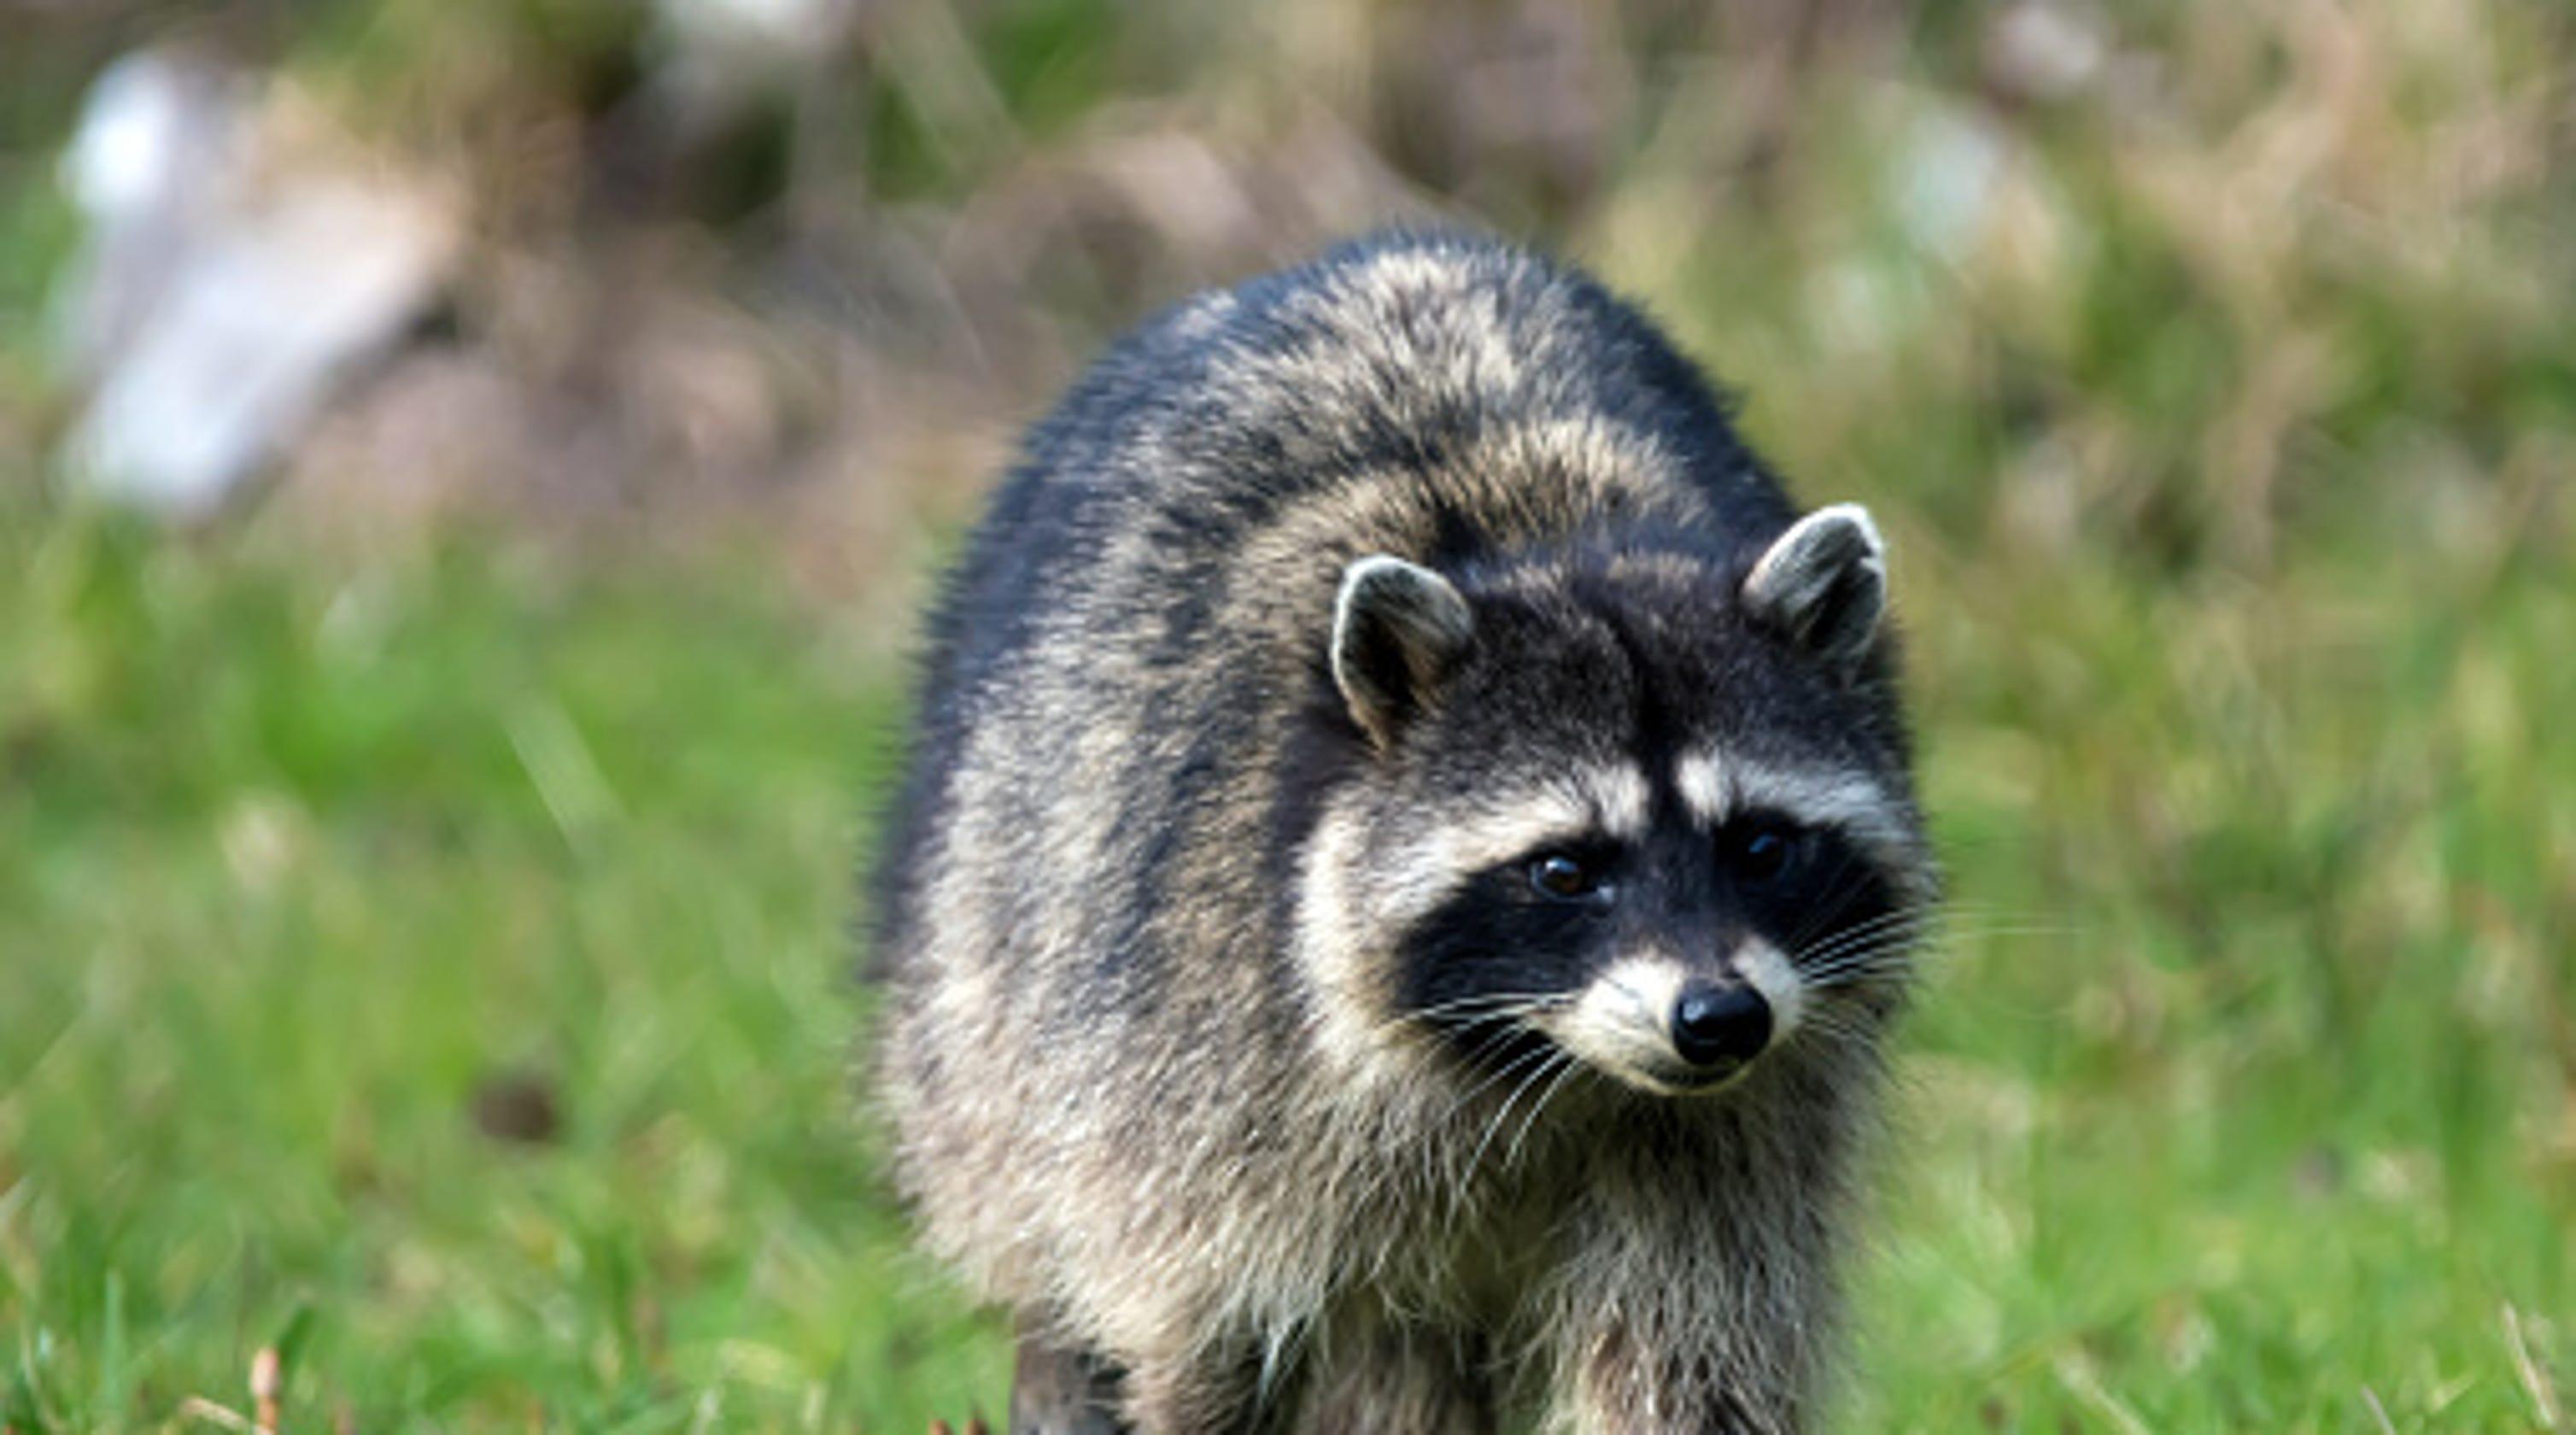 Florida police catch raccoon inside high school vending machine